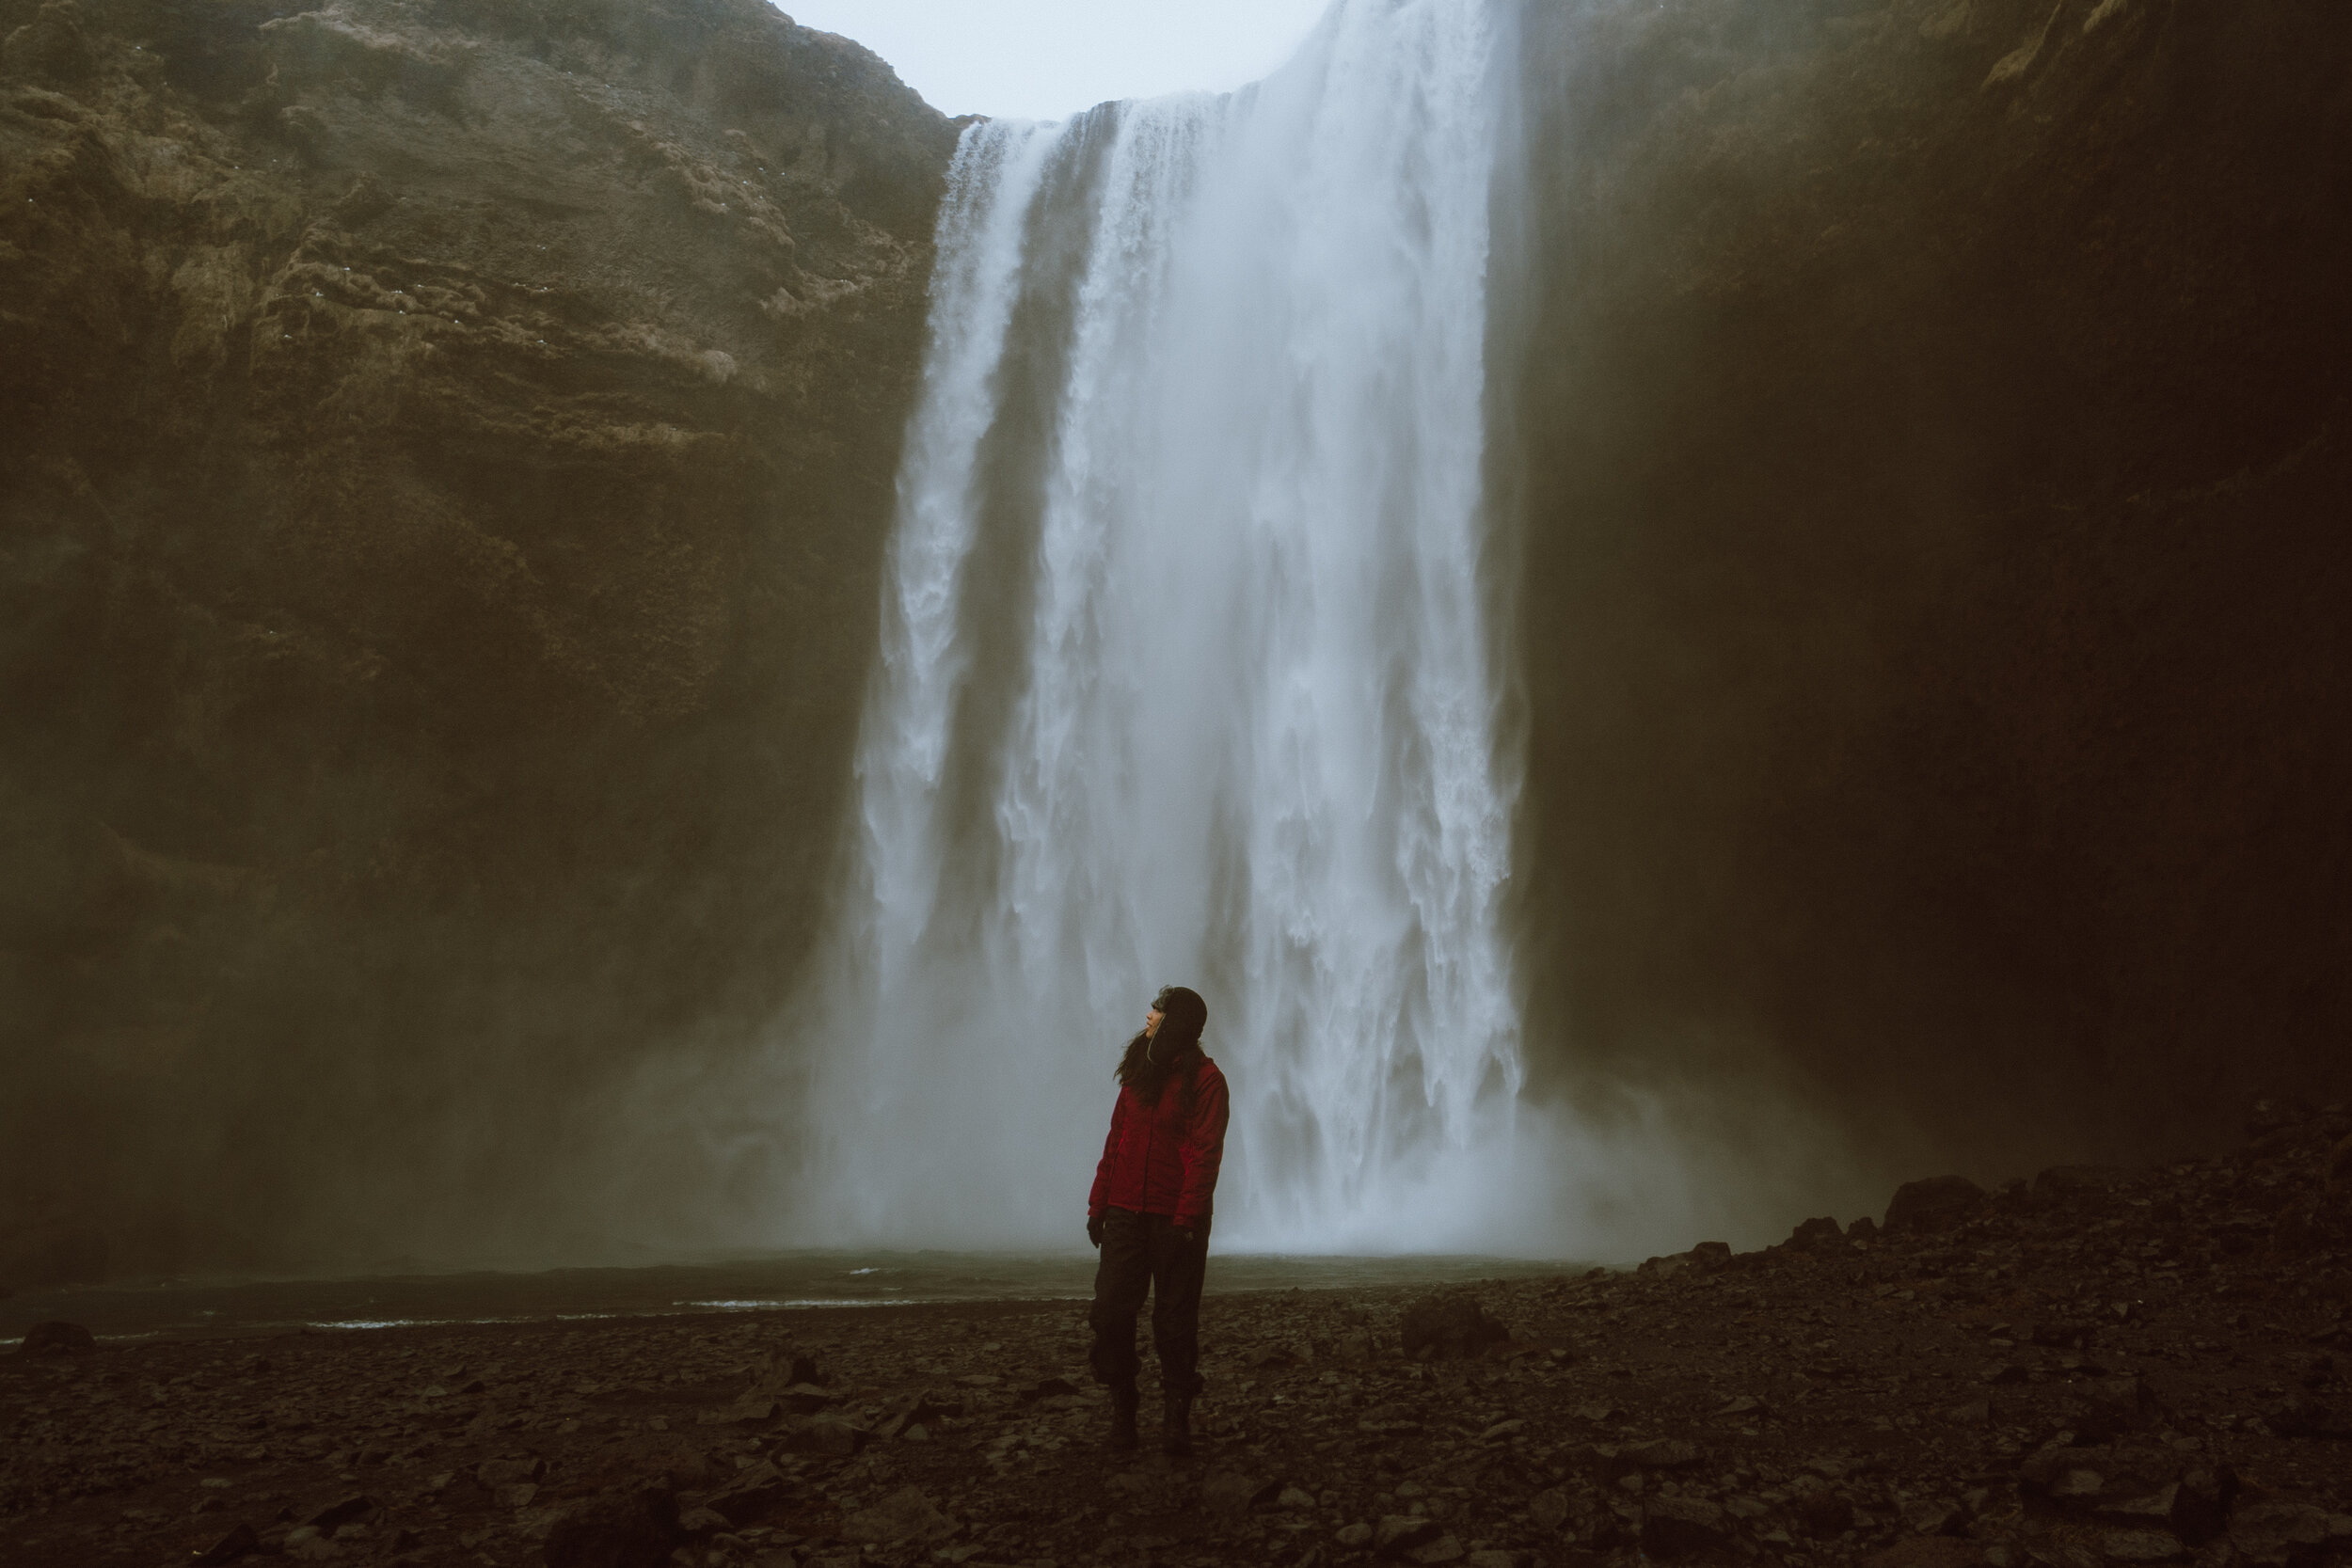 Mel在冰岛斯科息 - 盐湖租赁服务